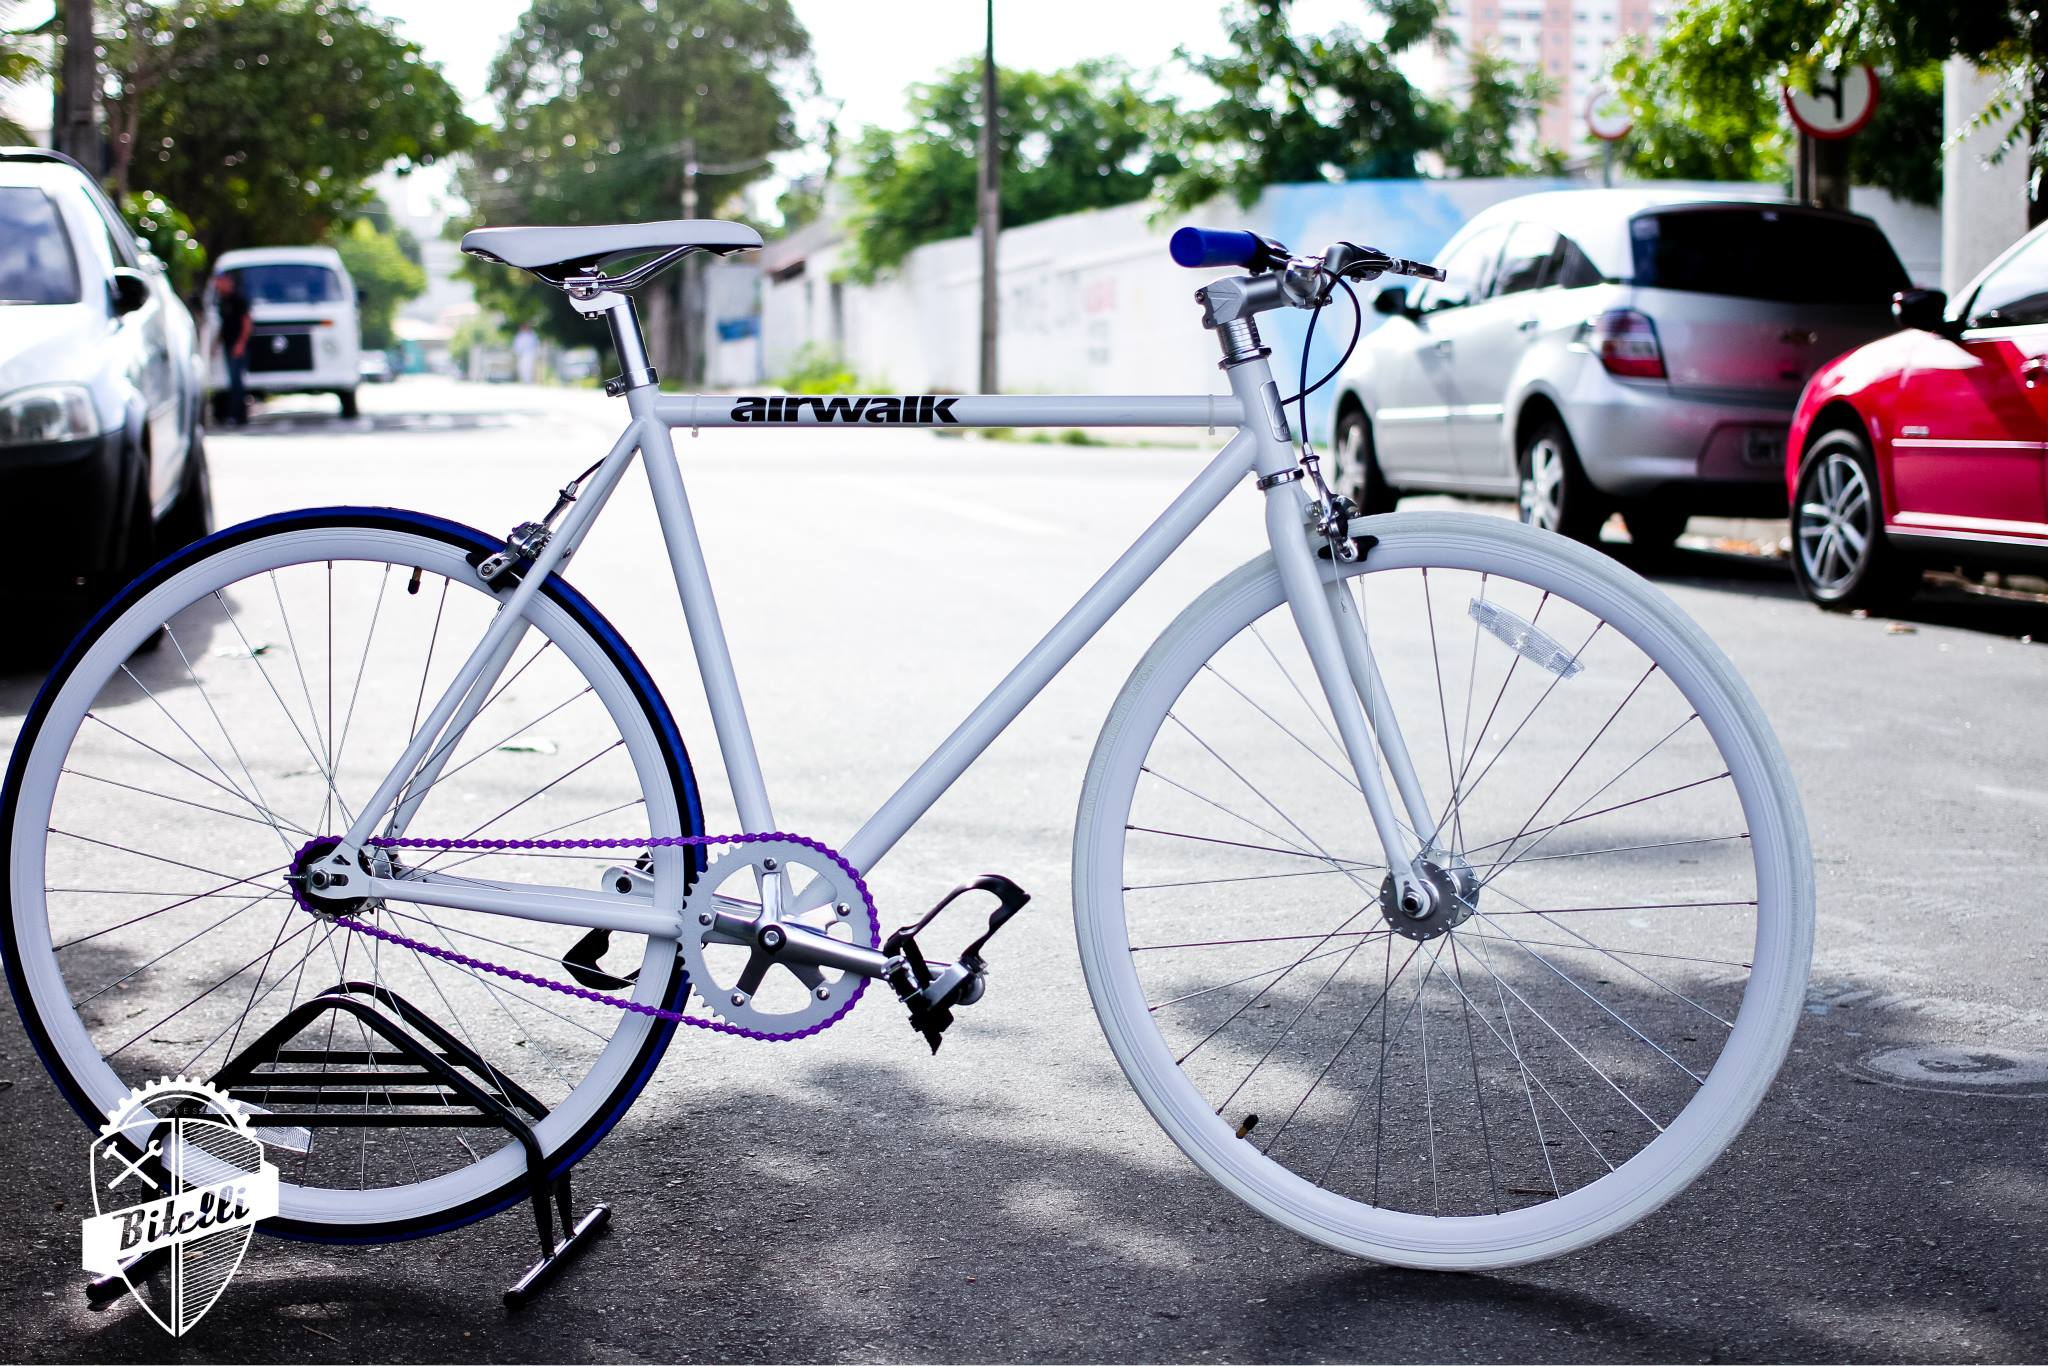 onde comprar bike fixa   De bike na cidade bda0c6991b